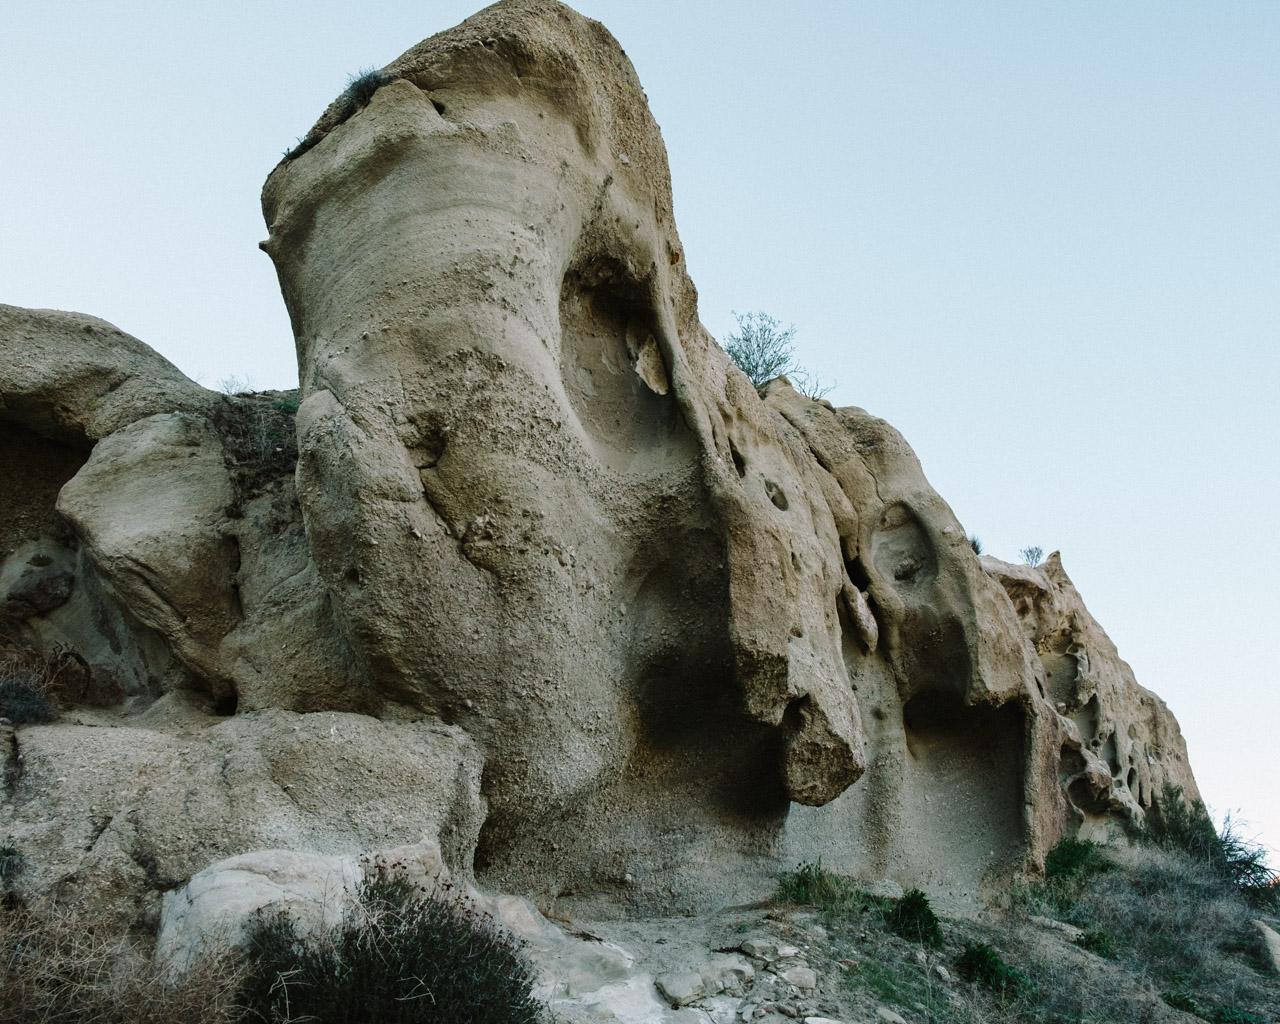 Fantasy-like caves dot Vasquez Rocks Park